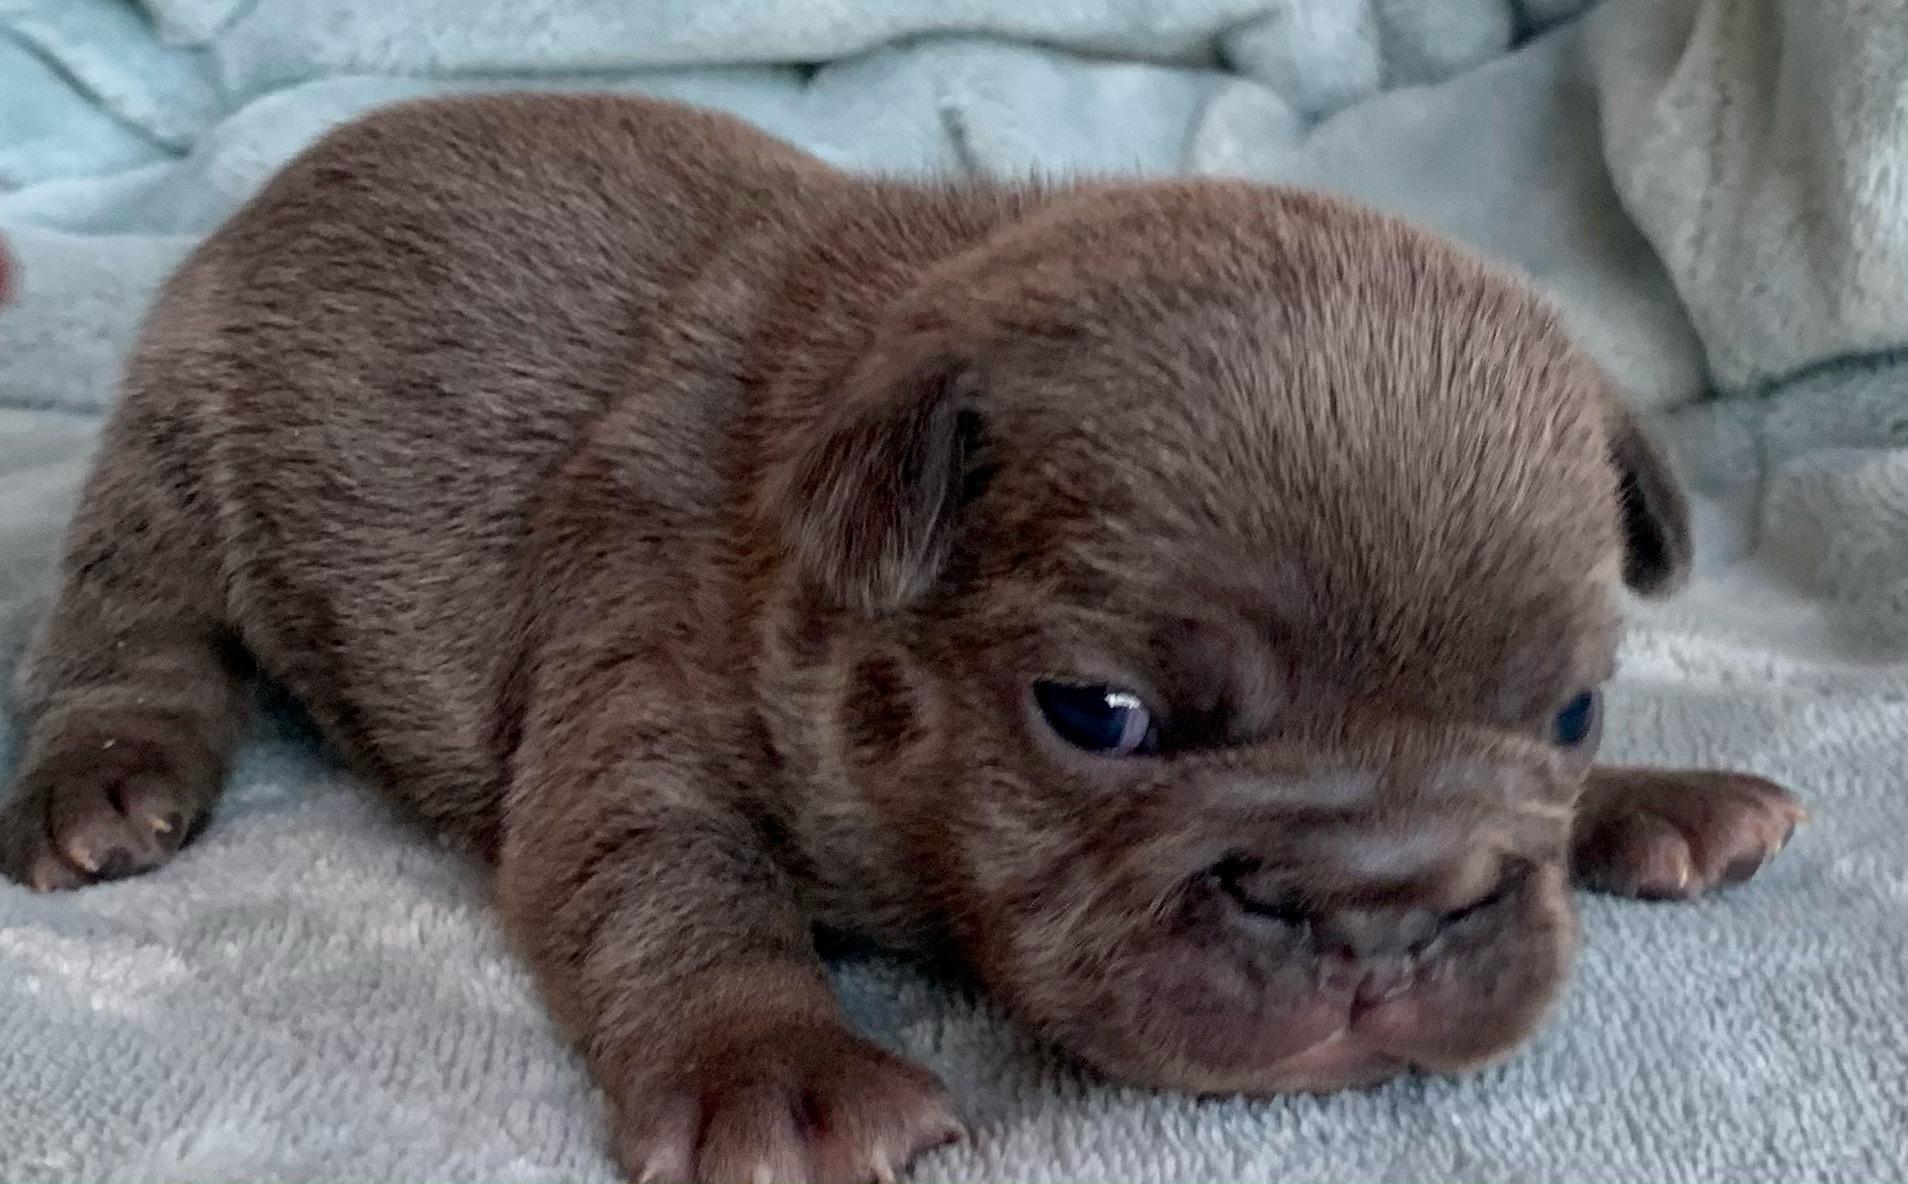 Blue and Merle French Bulldog Litter: February 6, 2021